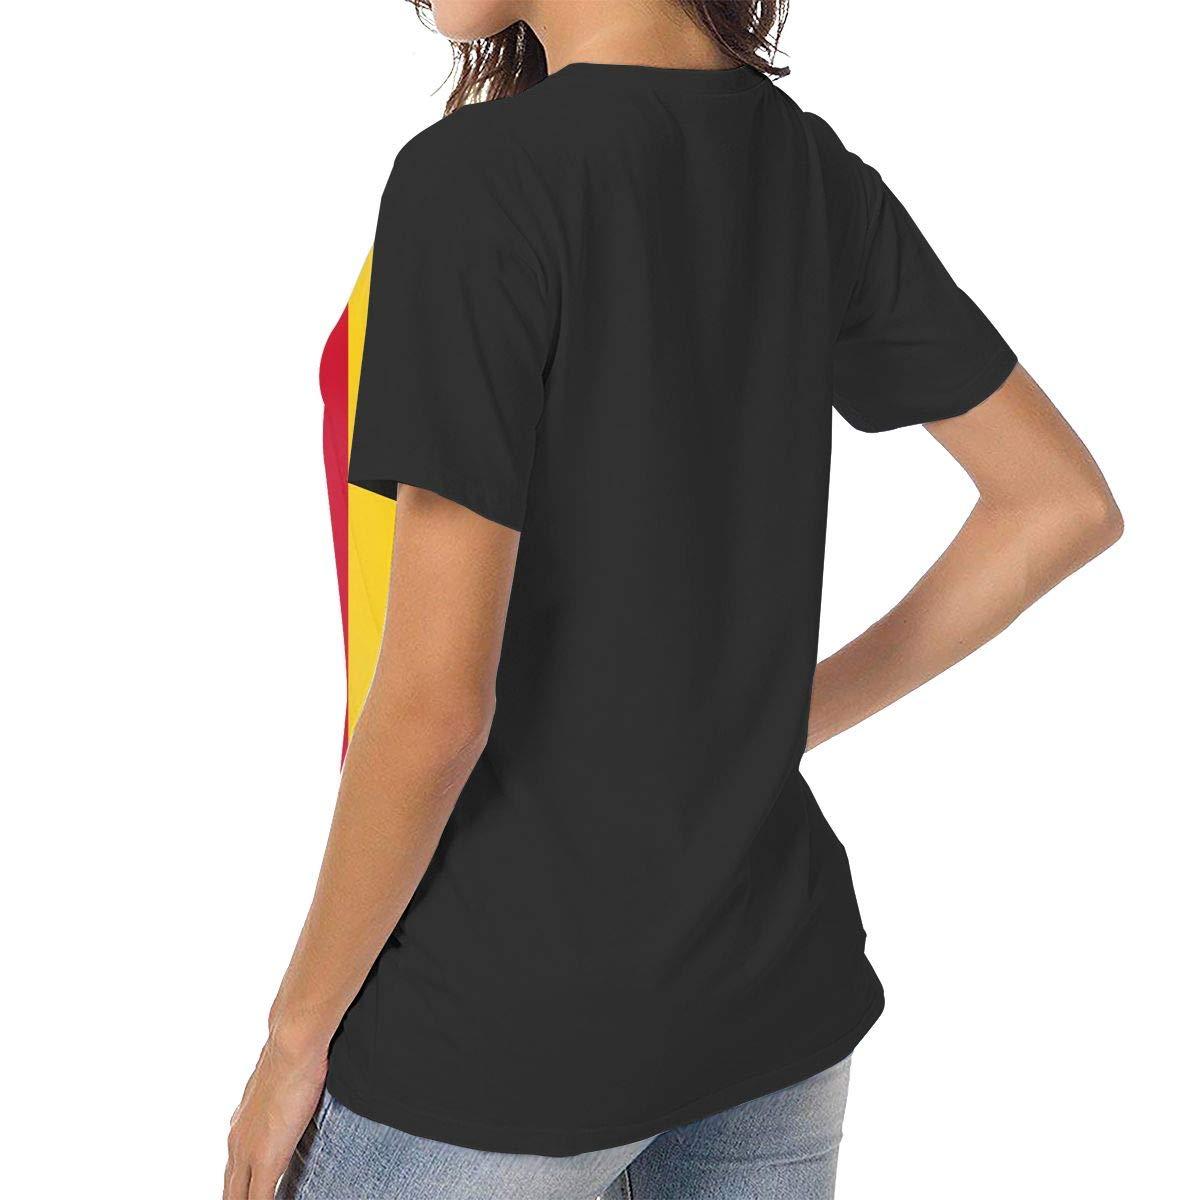 IRON1974 Womens Flag of Romania Short Sleeve T-Shirt Baseball Tees